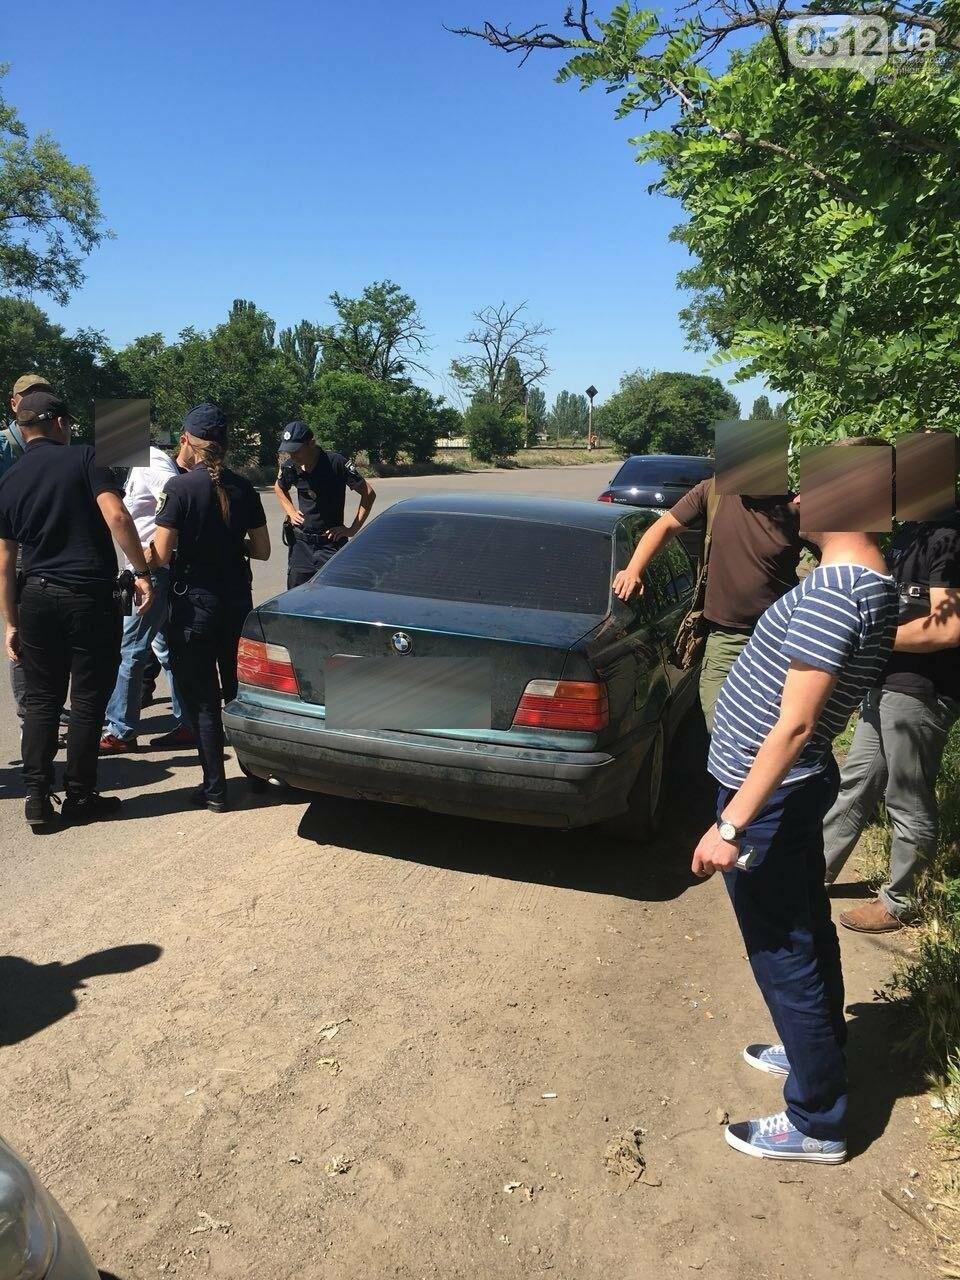 В Николаеве остановили пьяного водителя BMW с ножом, - ФОТО, фото-4